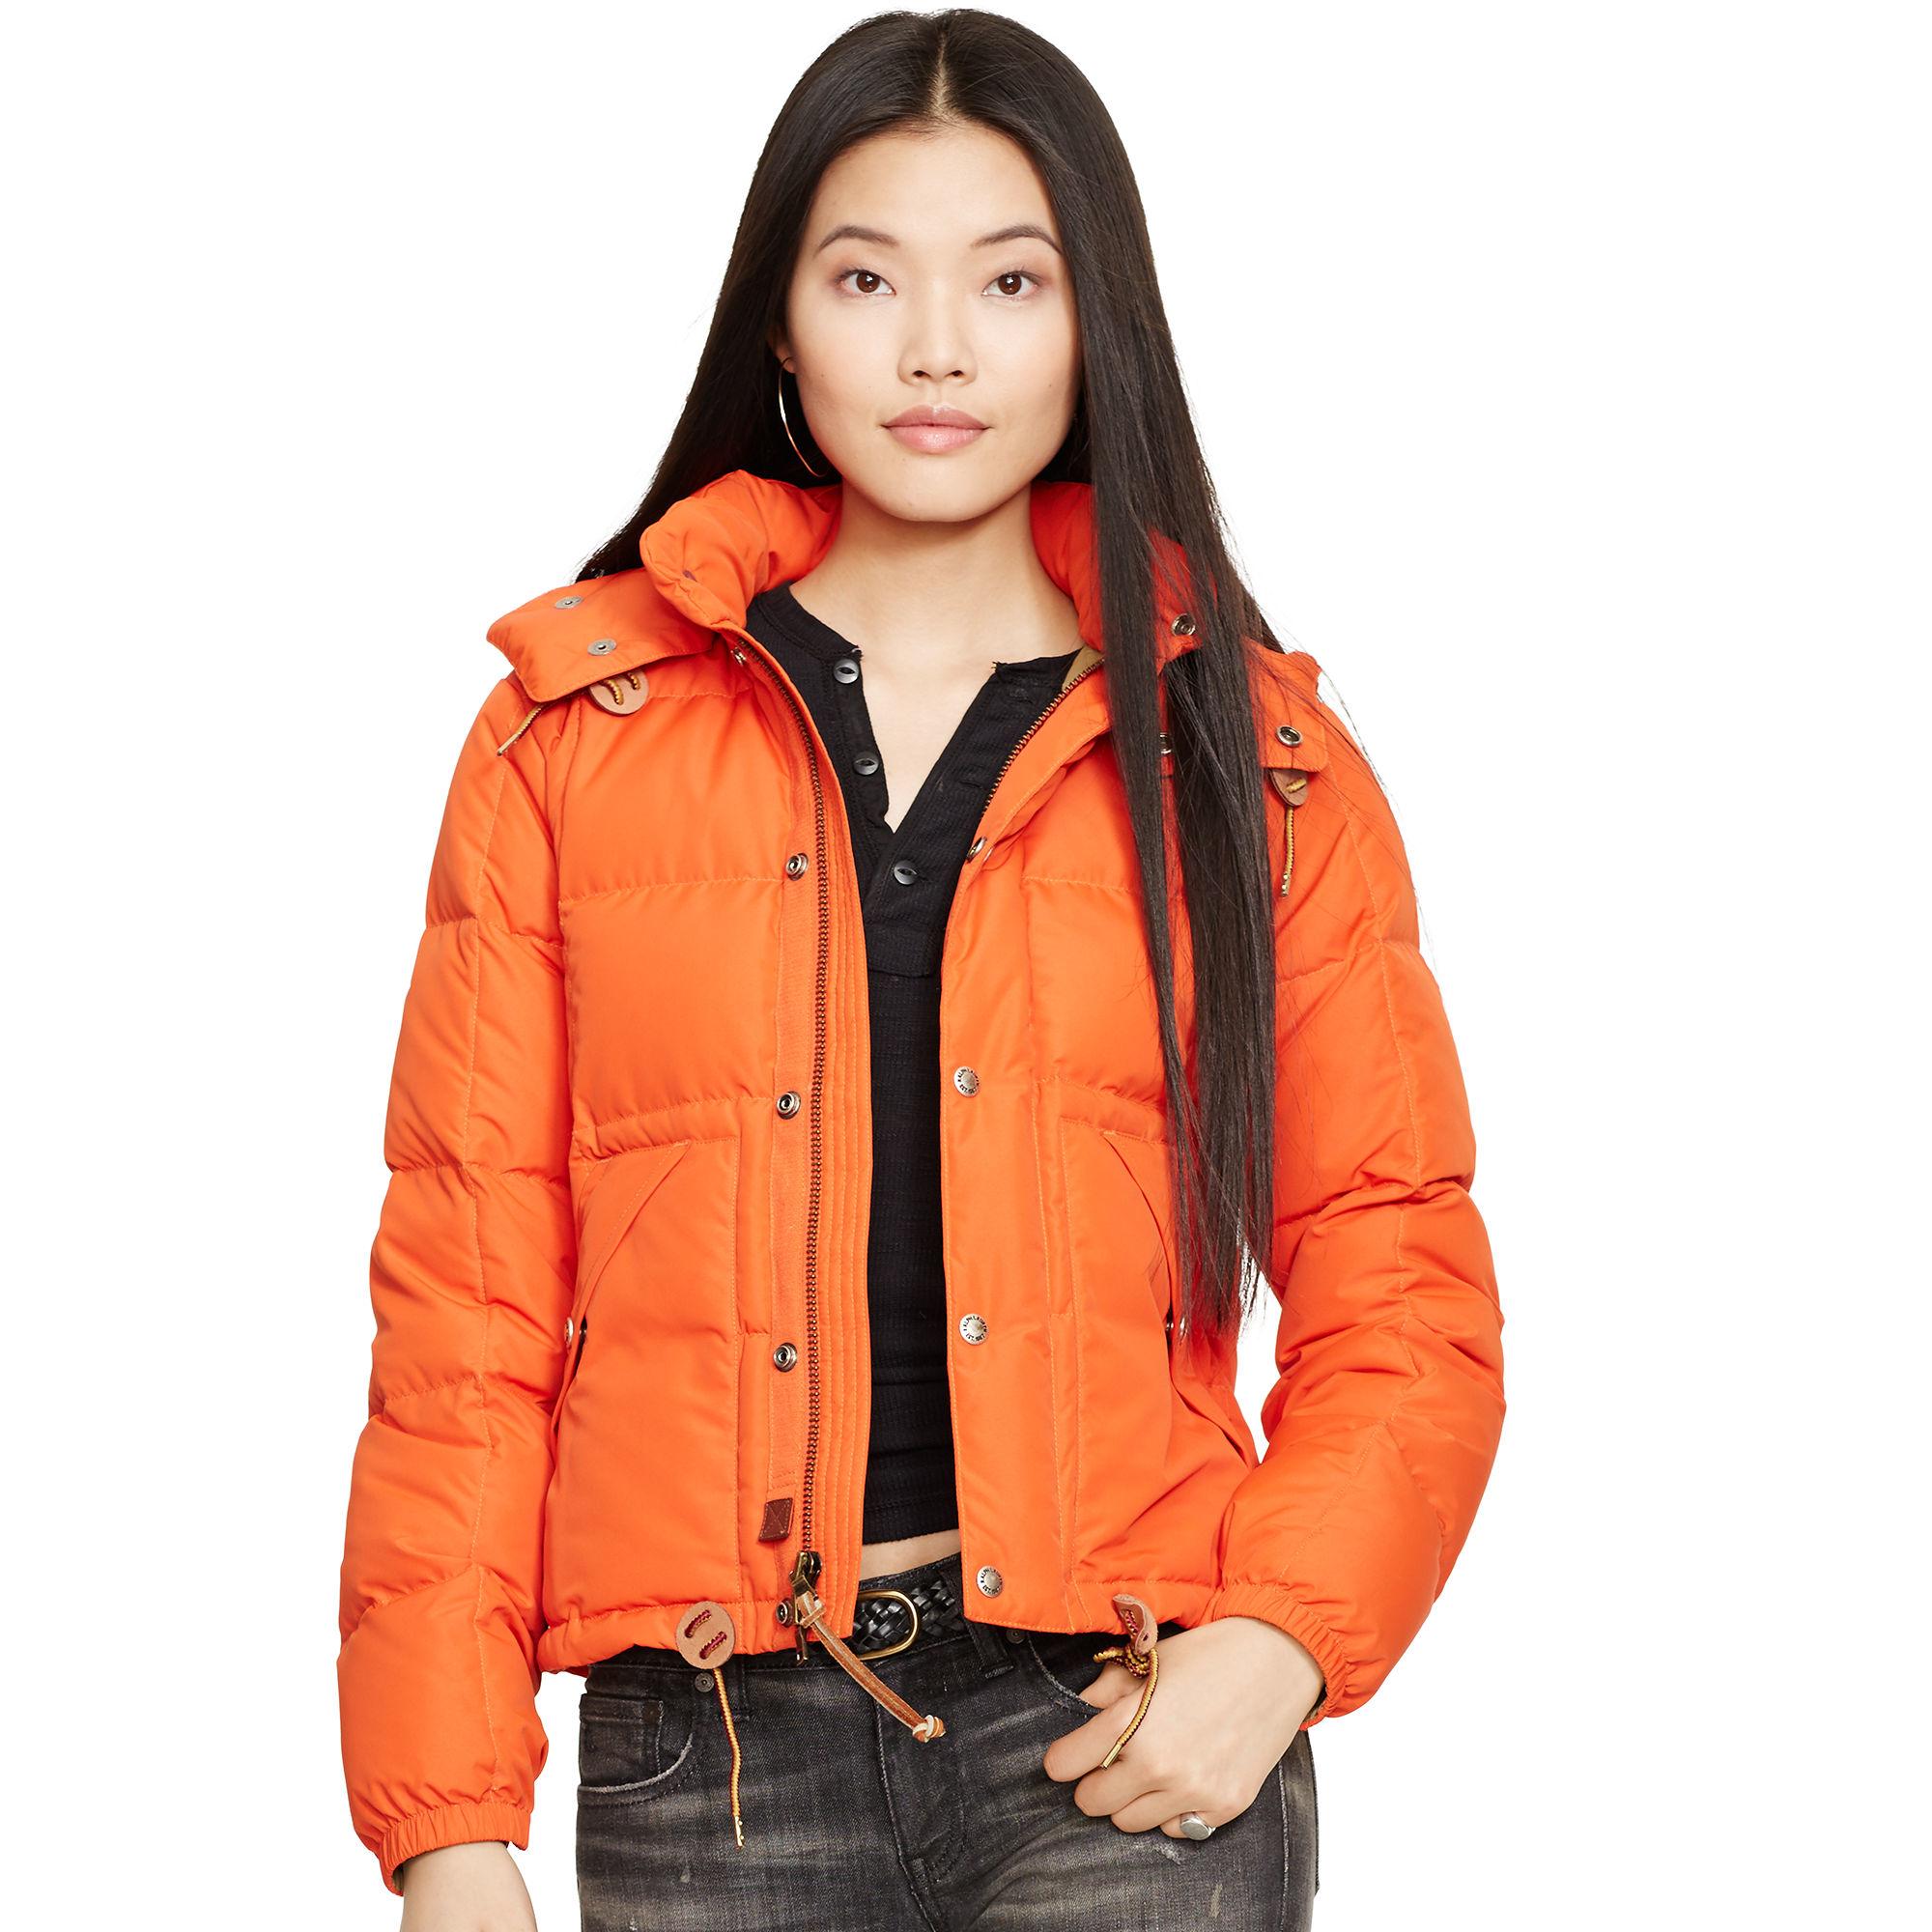 Polo ralph lauren Hooded Down Jacket in Orange